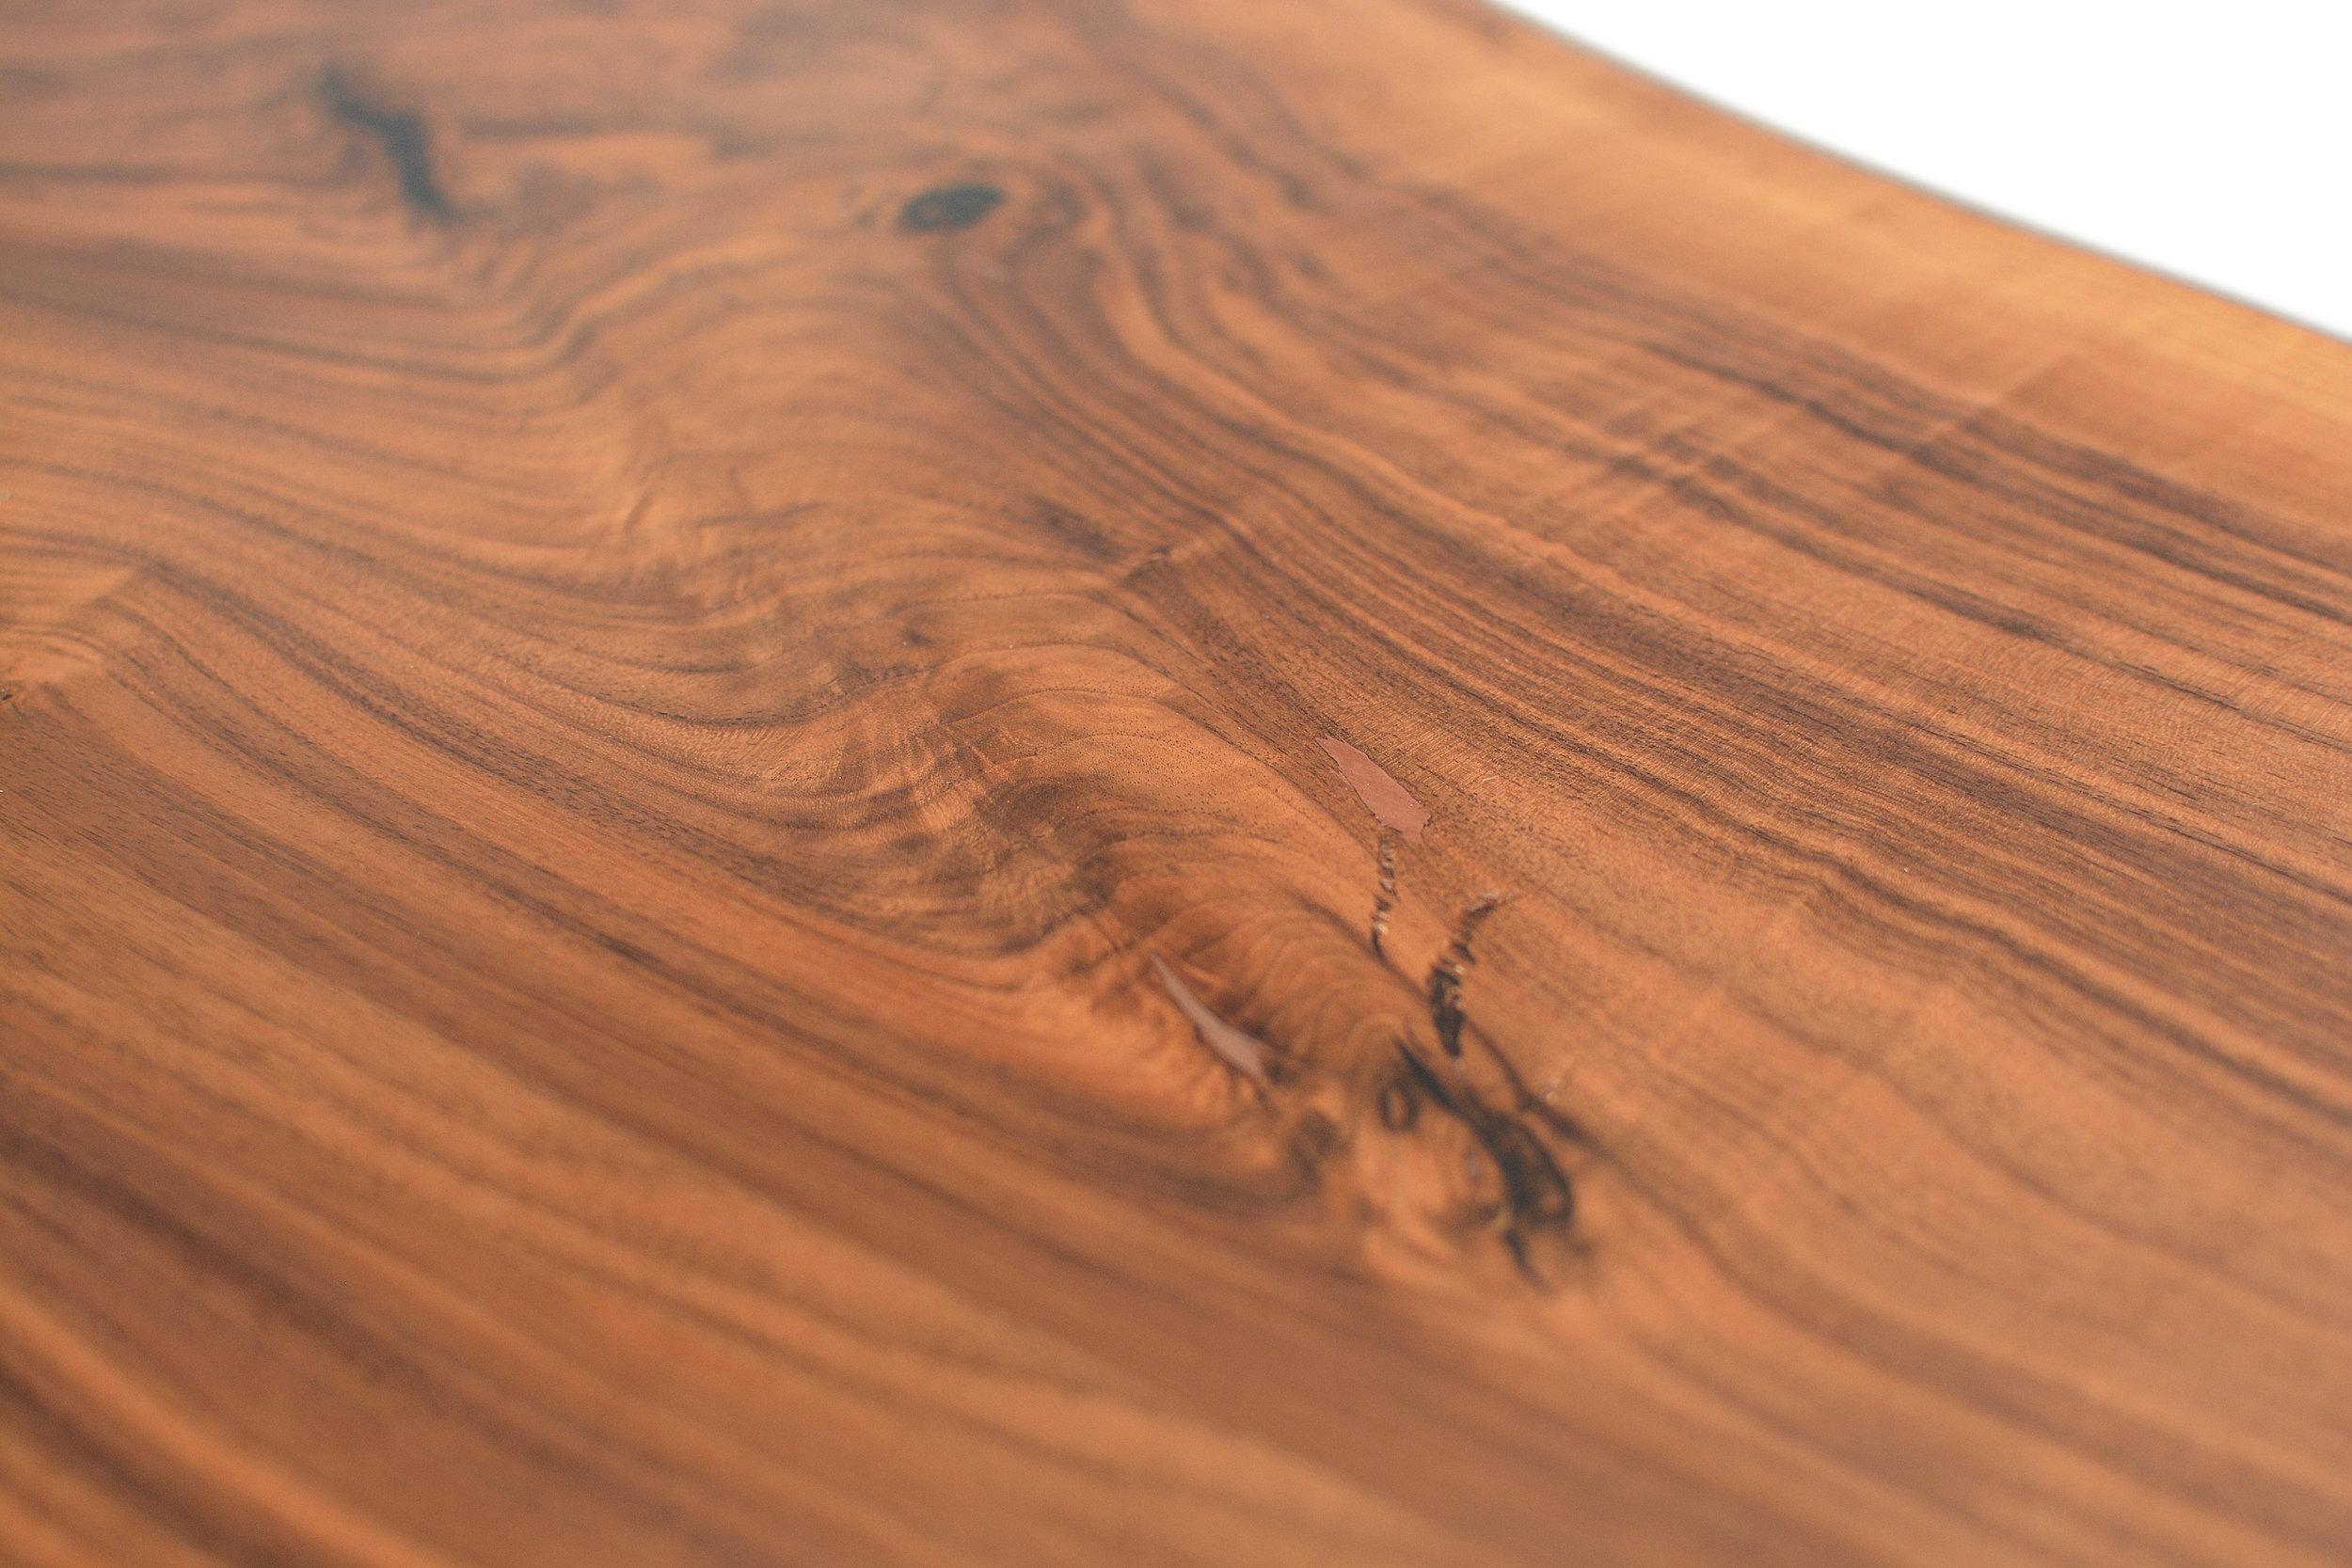 Etz & Steel Hermes Live Edge Walnut Table Close Up 13.JPG